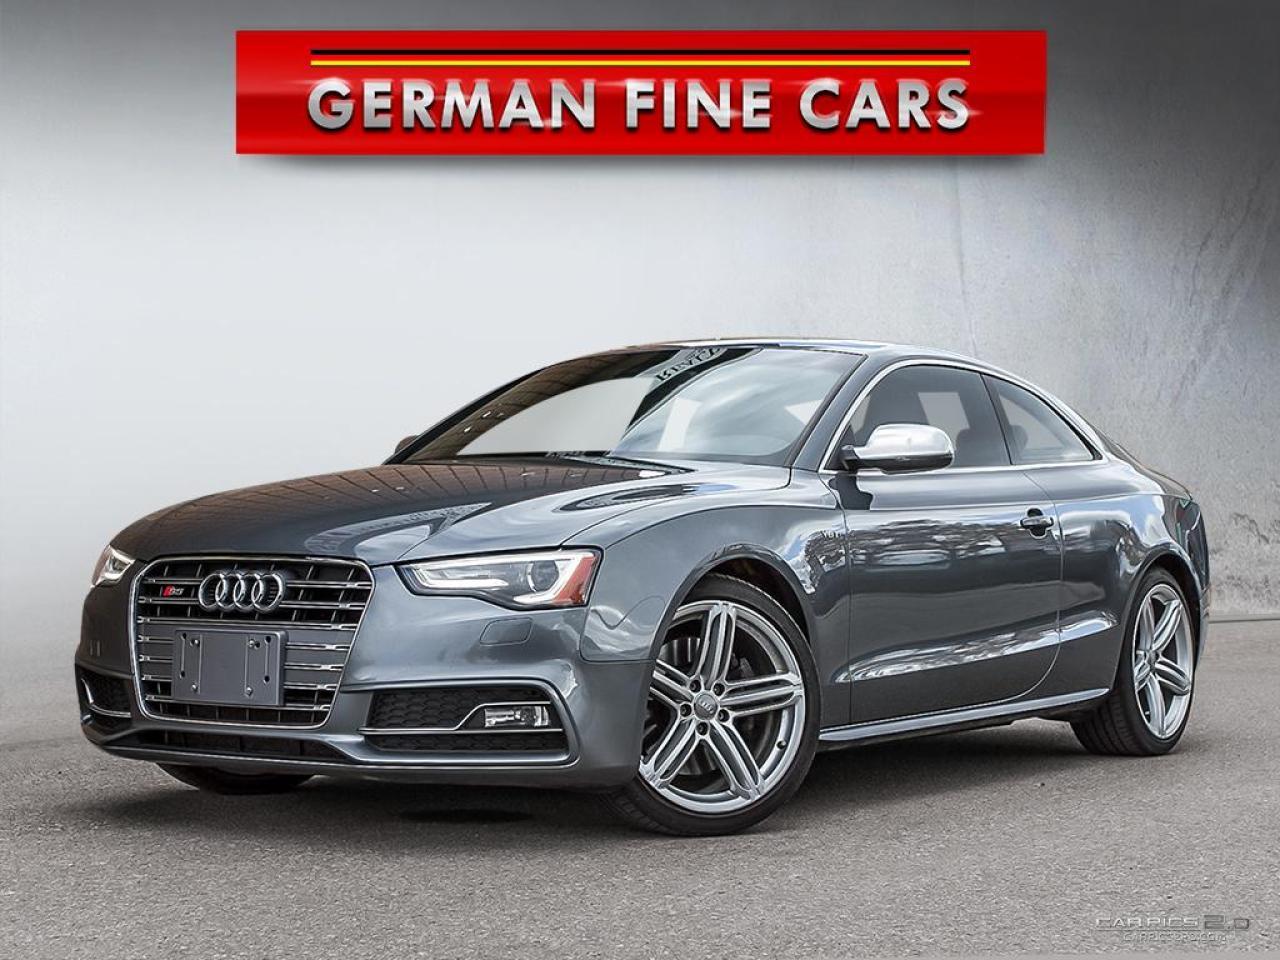 2013 Audi S5 **COUPE, 3.0T PREMIUM, NAVIGATION, AWD**